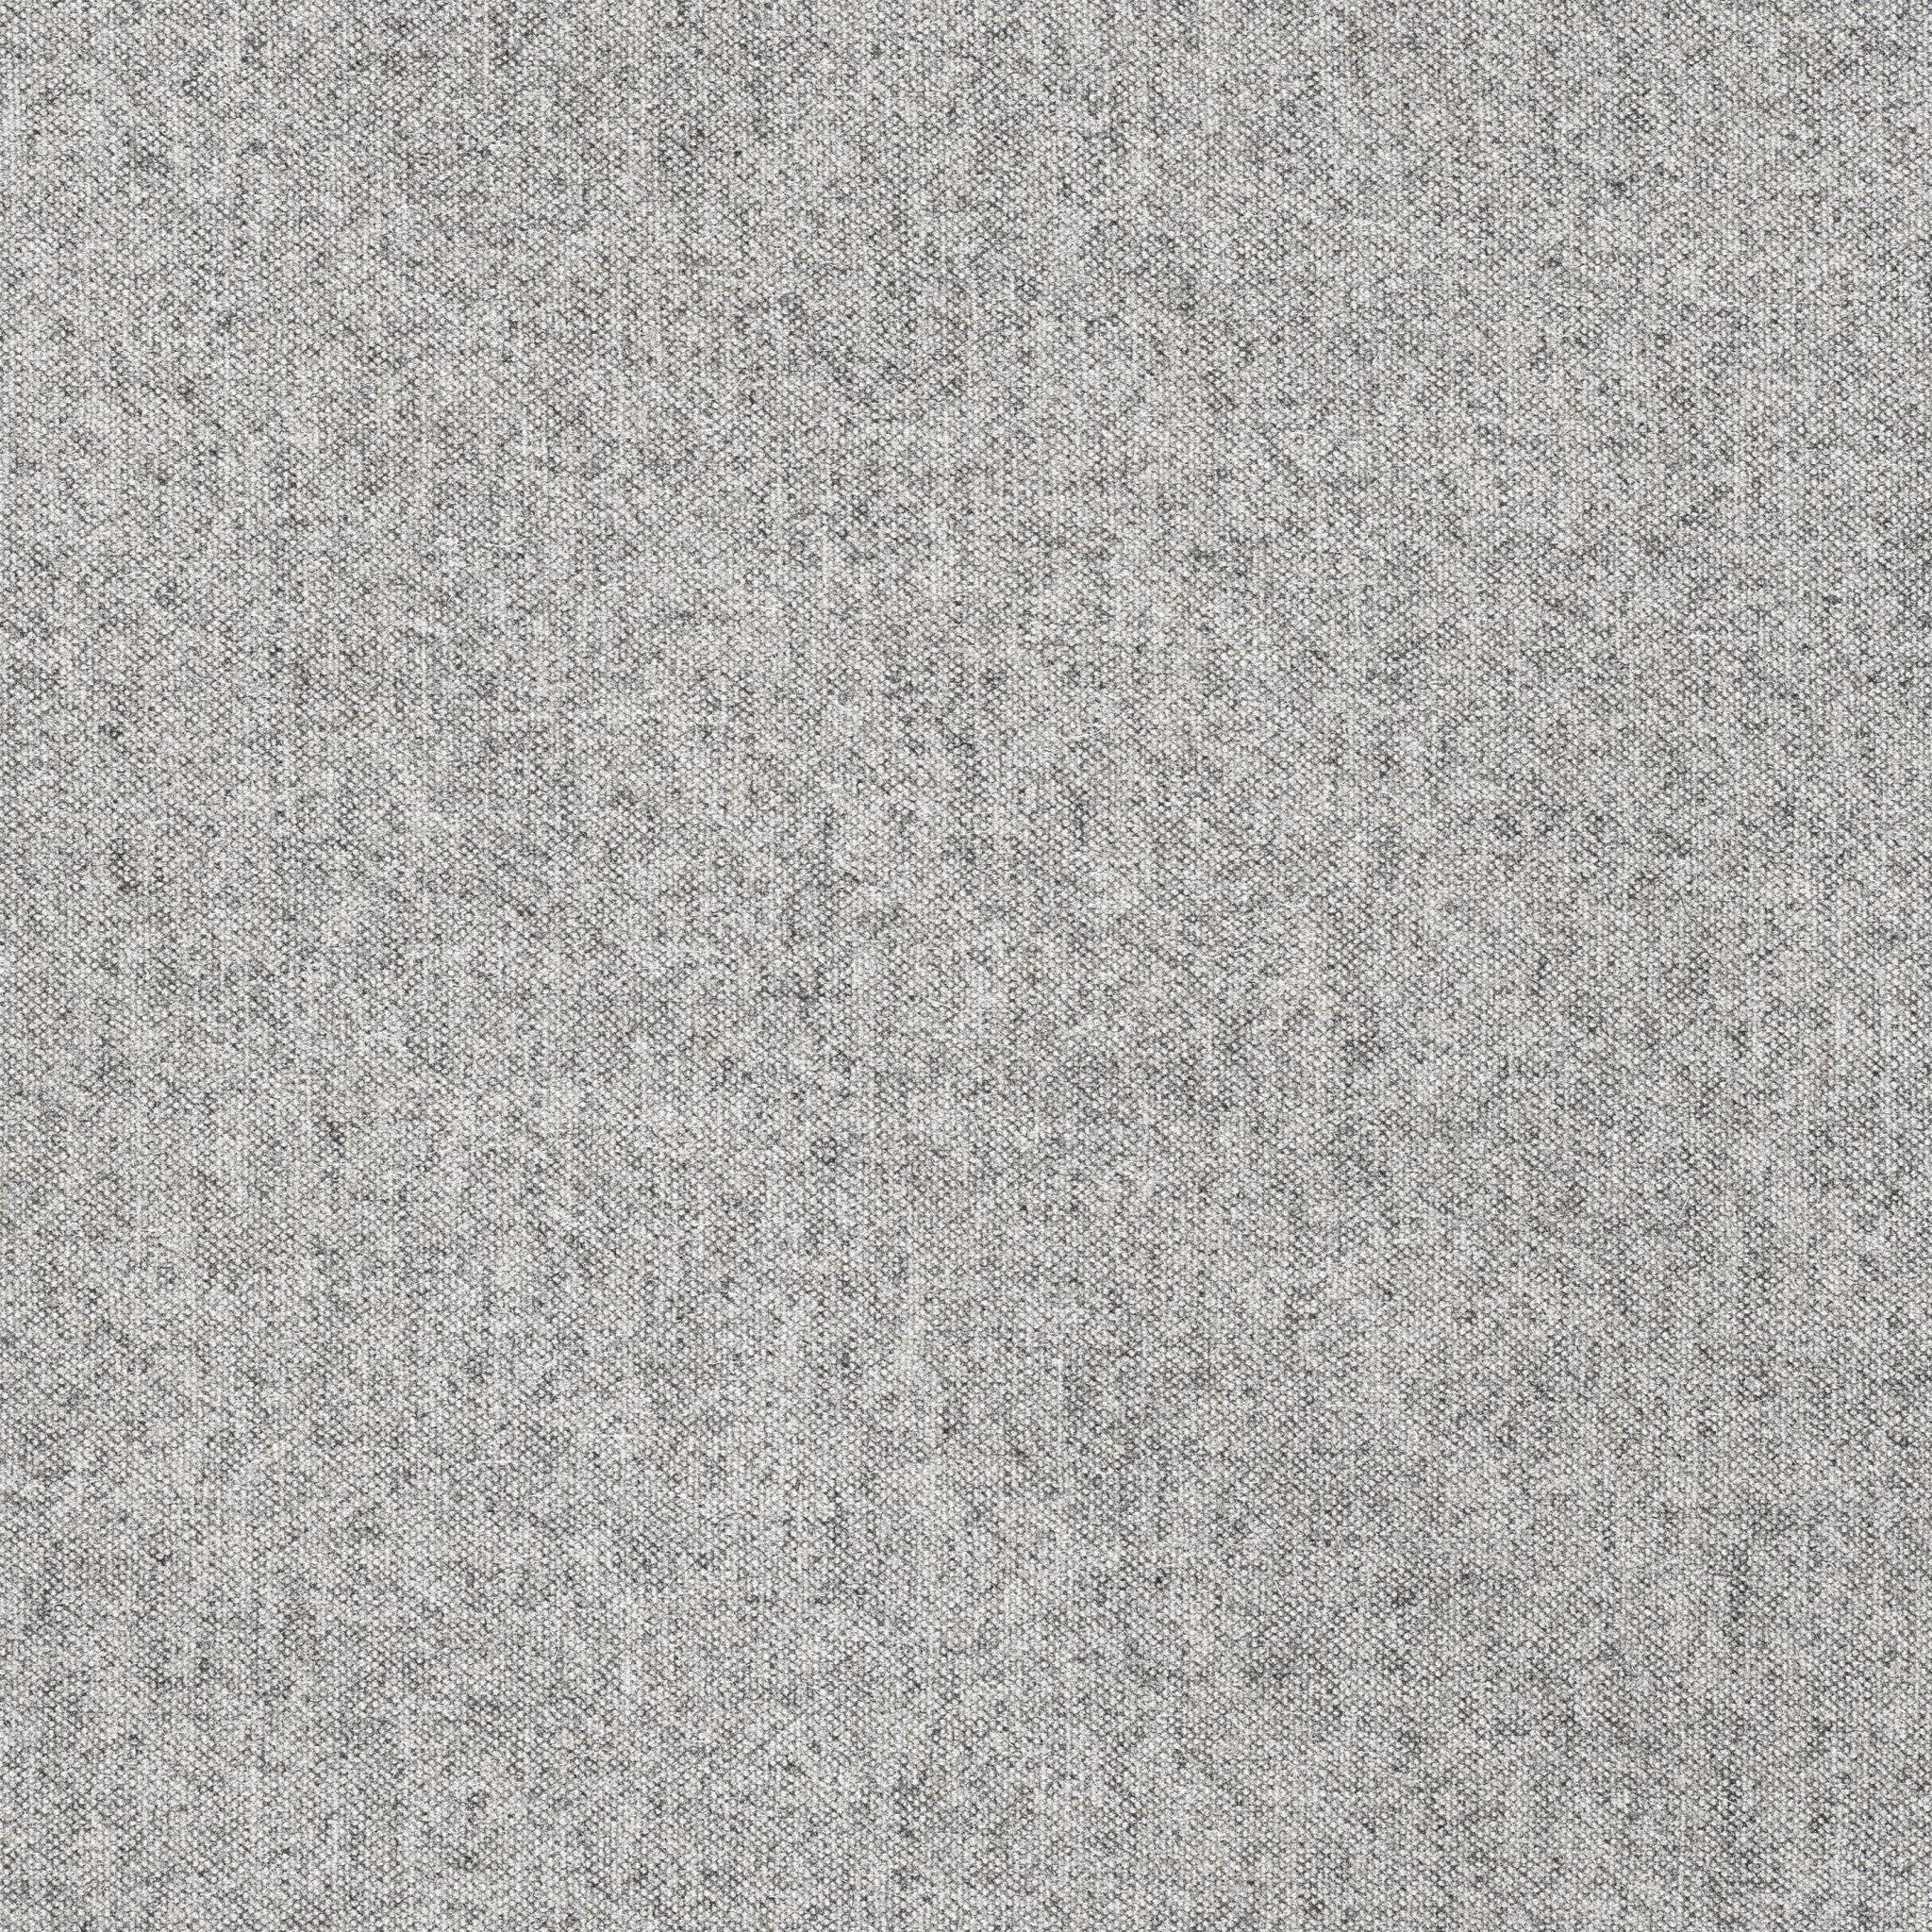 kvadrat  u2013 melange nap fabric  u2013 design akira minagawa